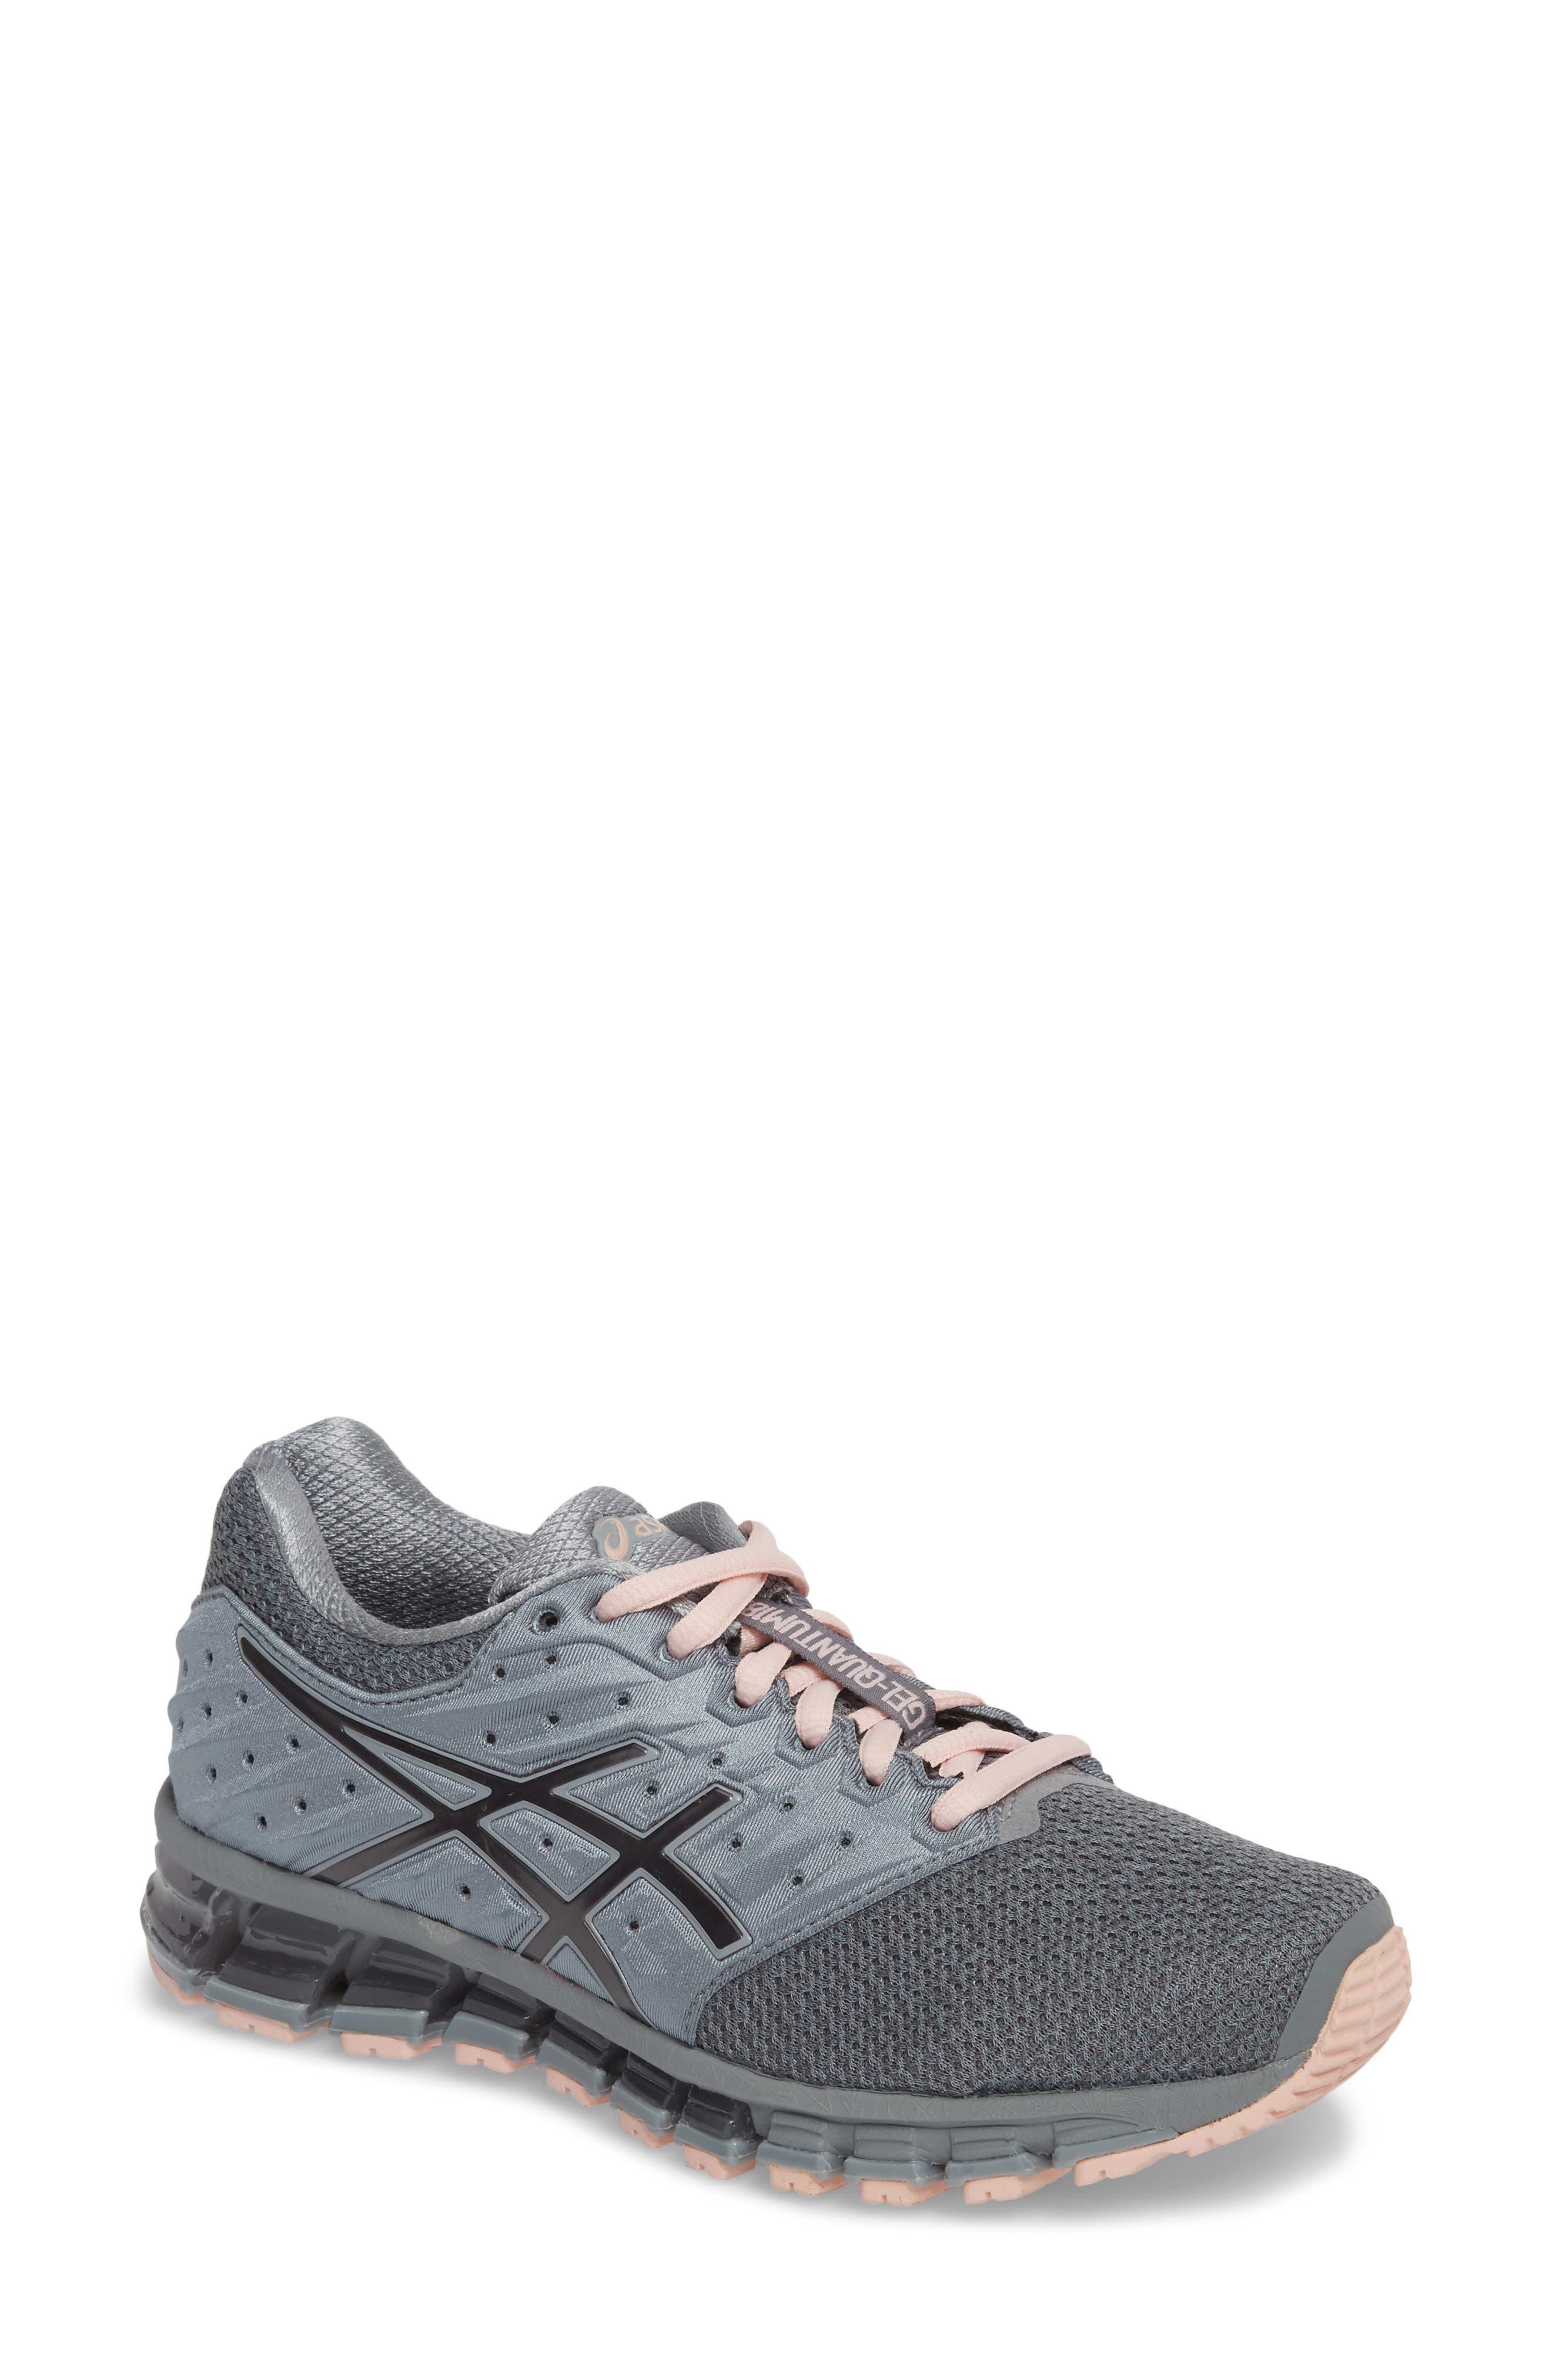 'GEL-Quantum 180 2' Running Shoe,                             Main thumbnail 1, color,                             Stone Grey/ Carbon/ Pink